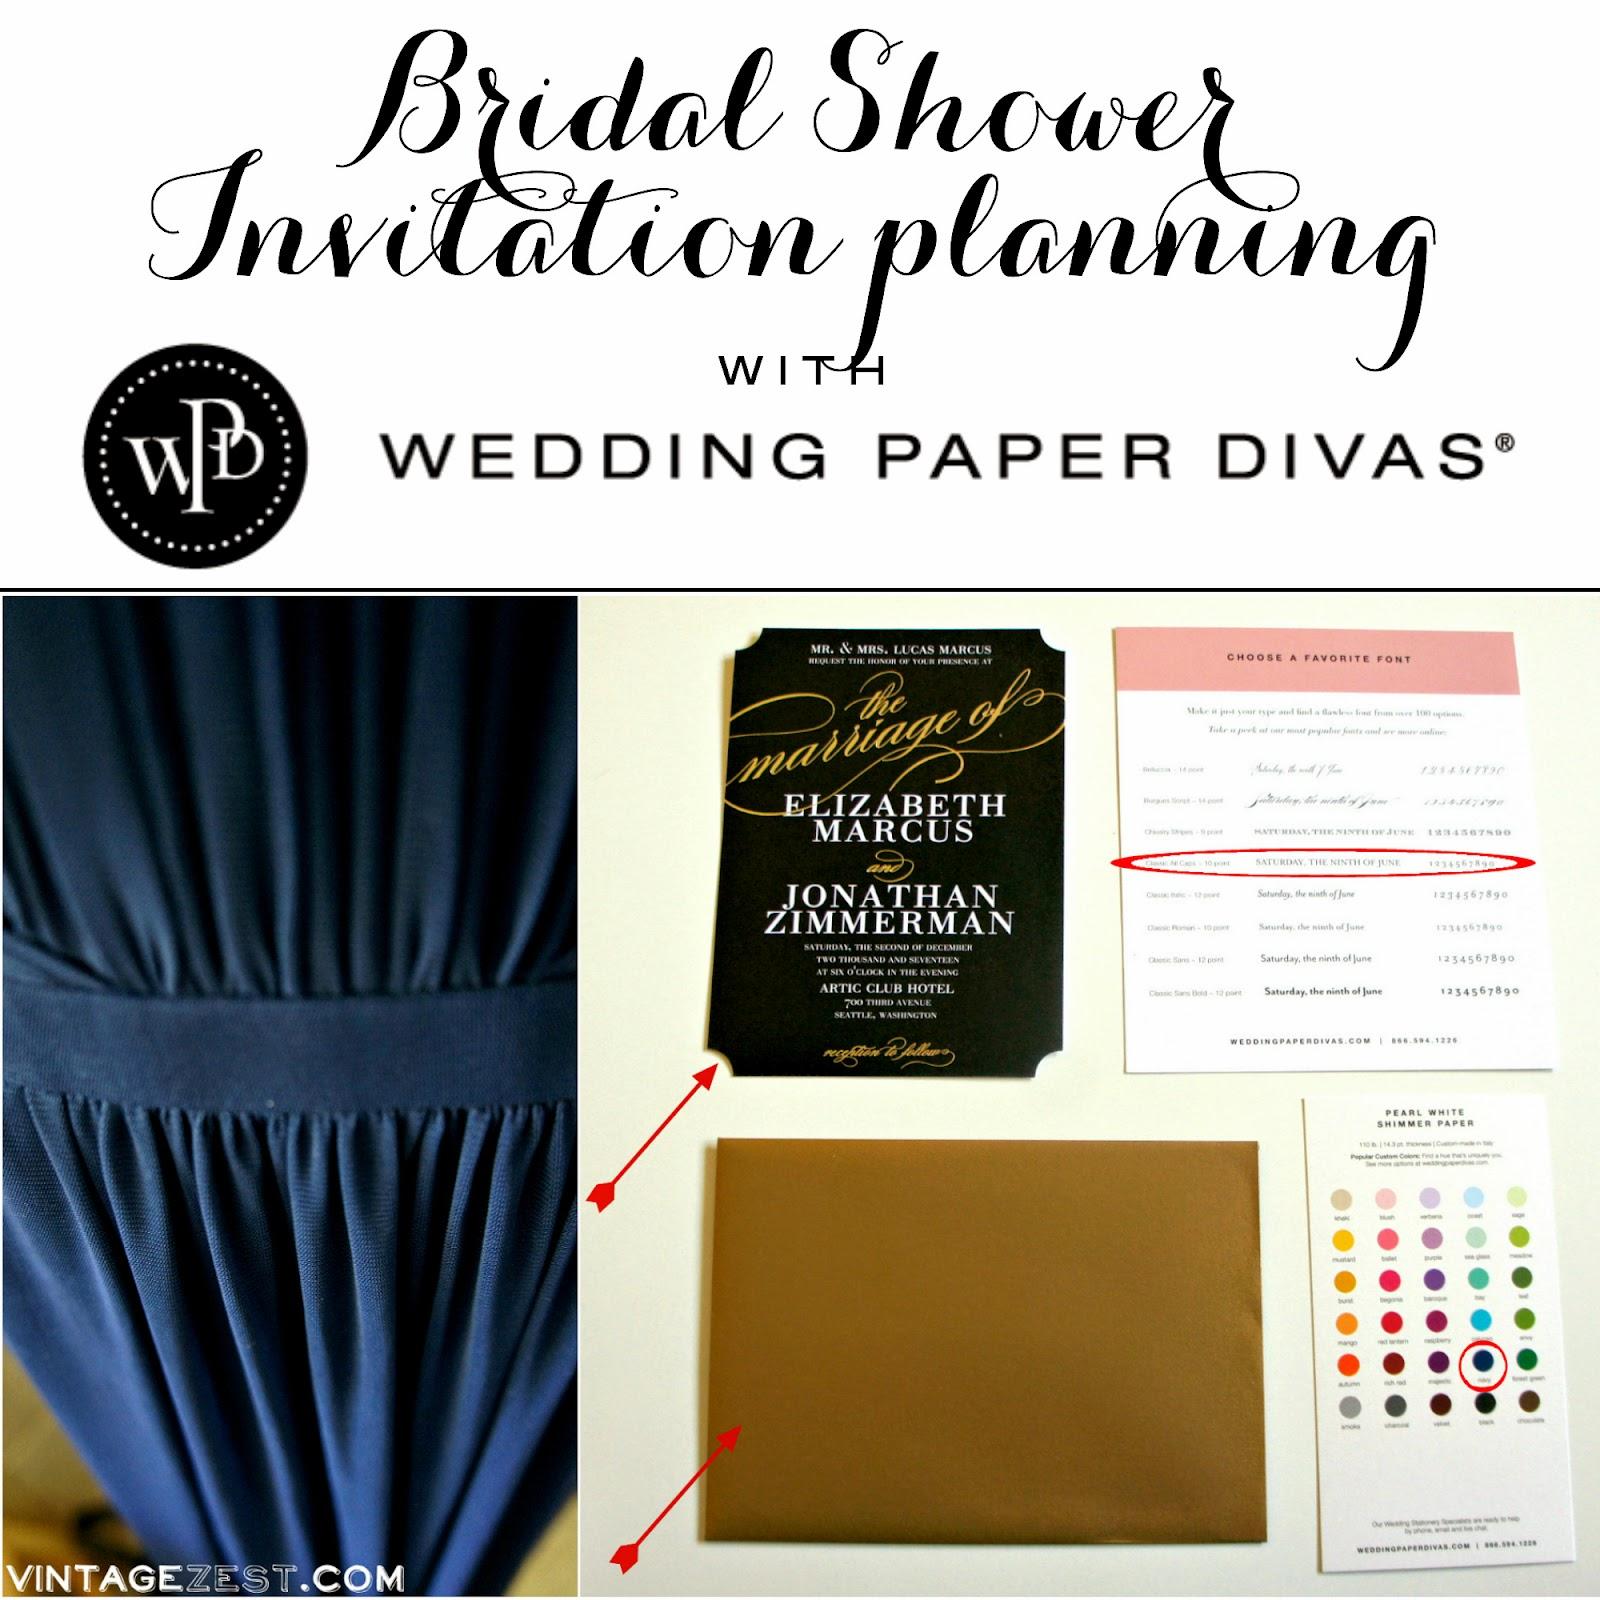 Bridal Shower Invitation planning with Wedding Paper Divas Dianes